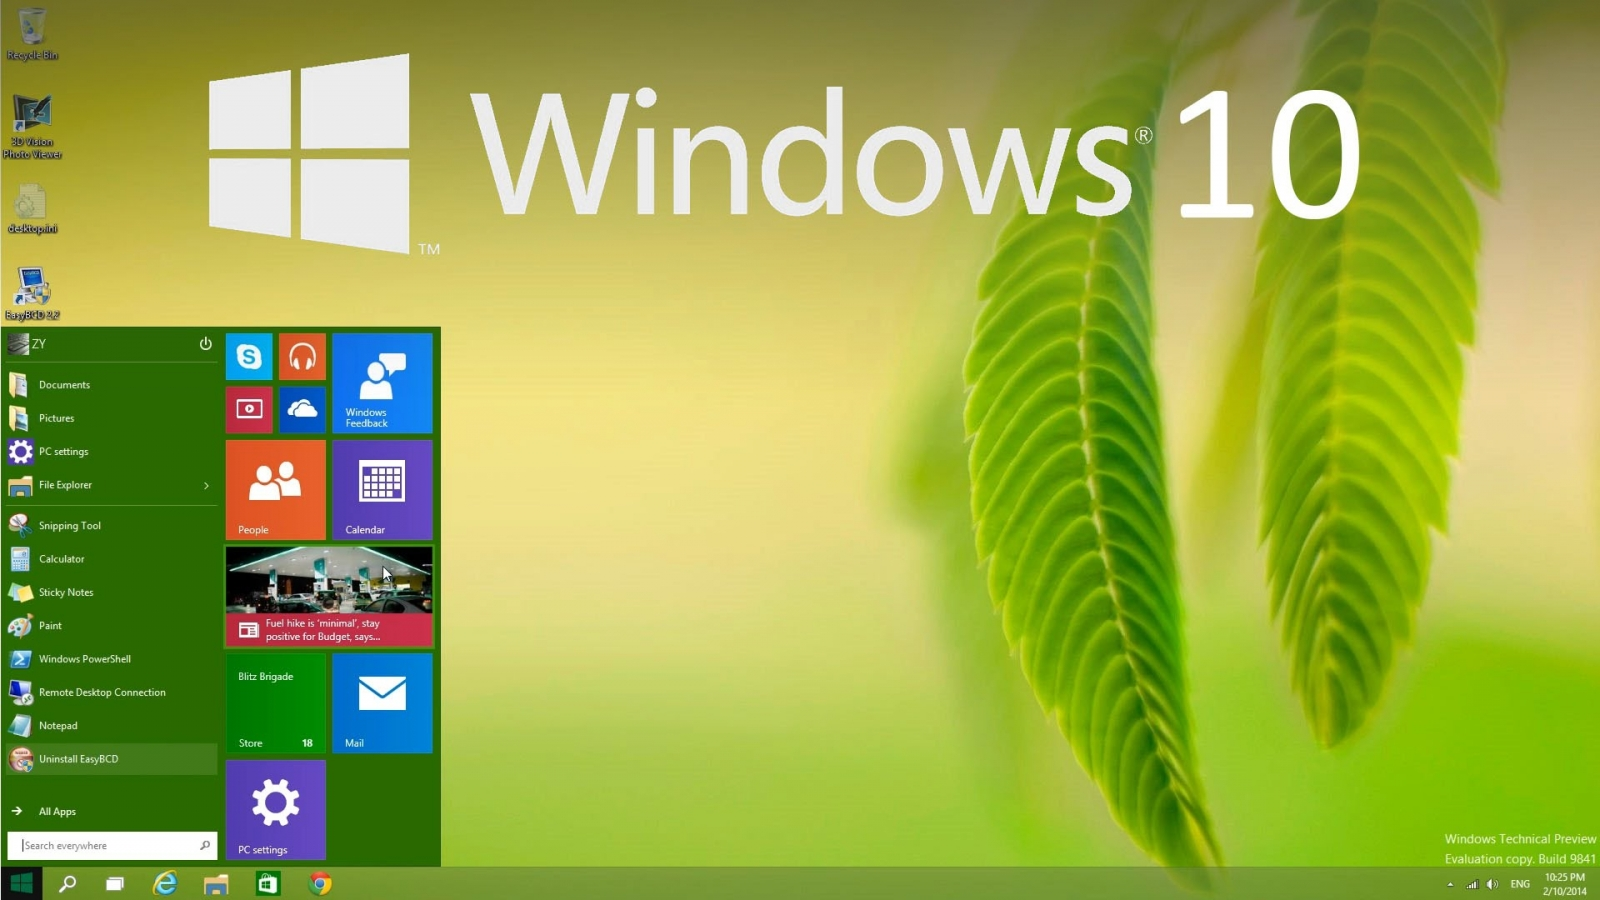 Windows 10 sound issues